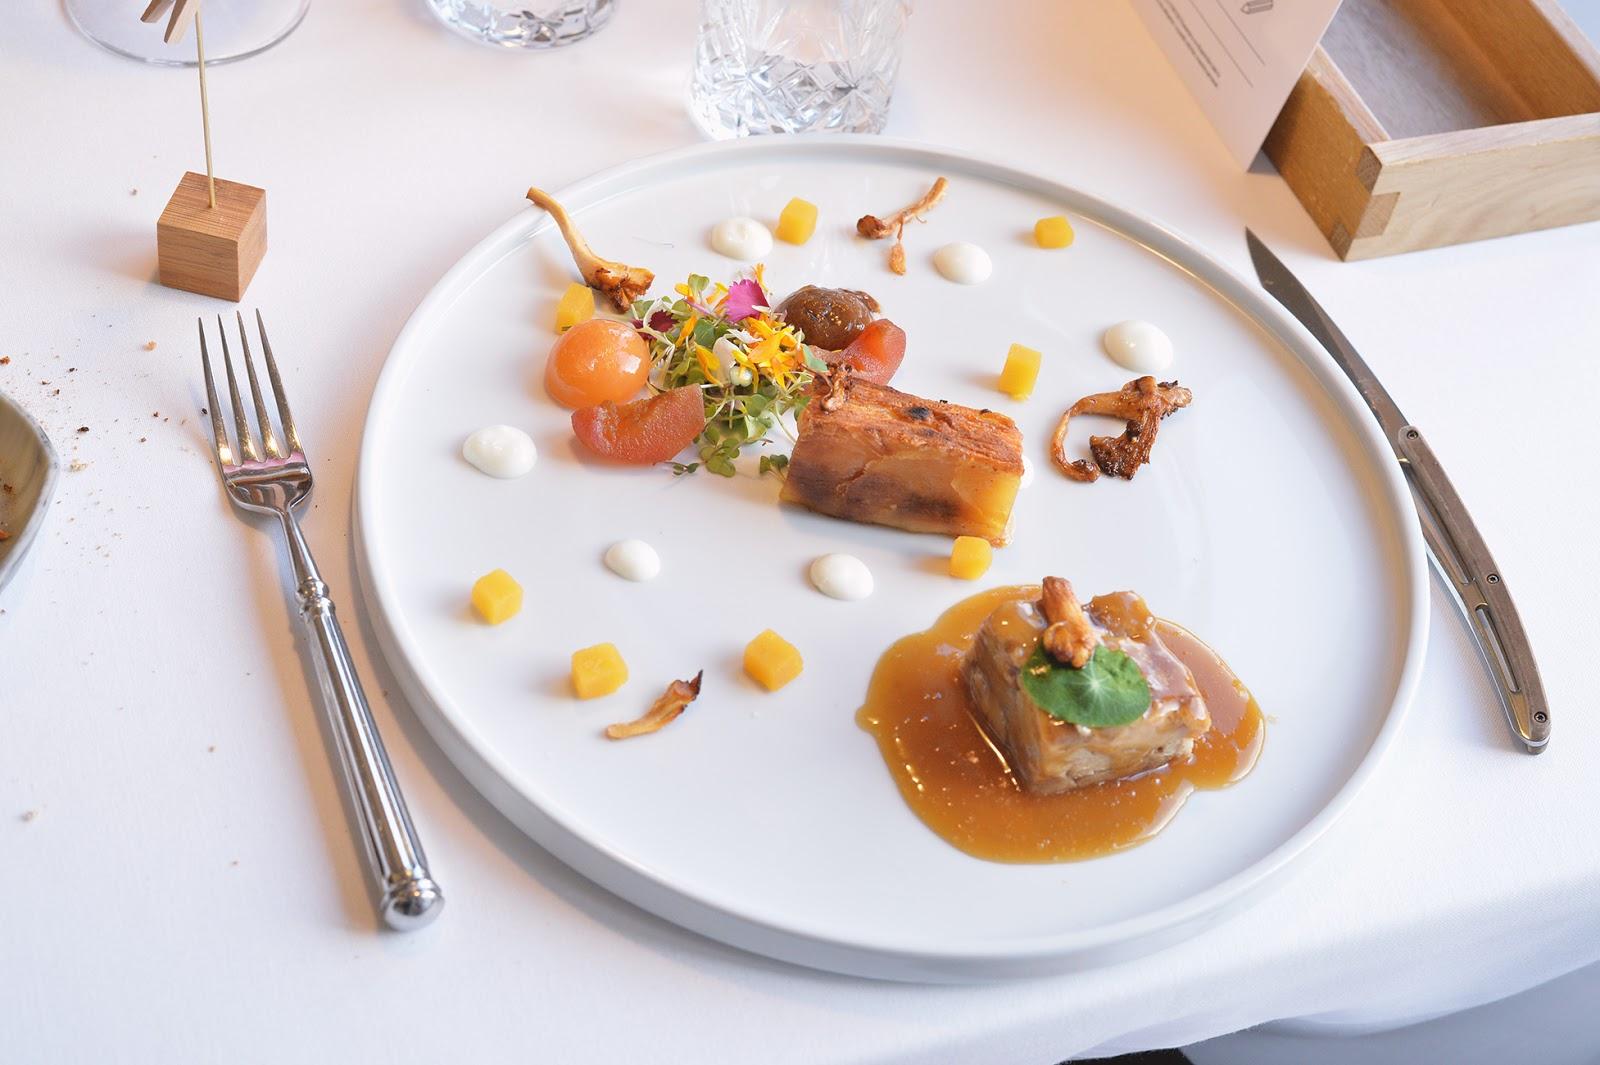 restaurante lav leon alfonso V hotel españa